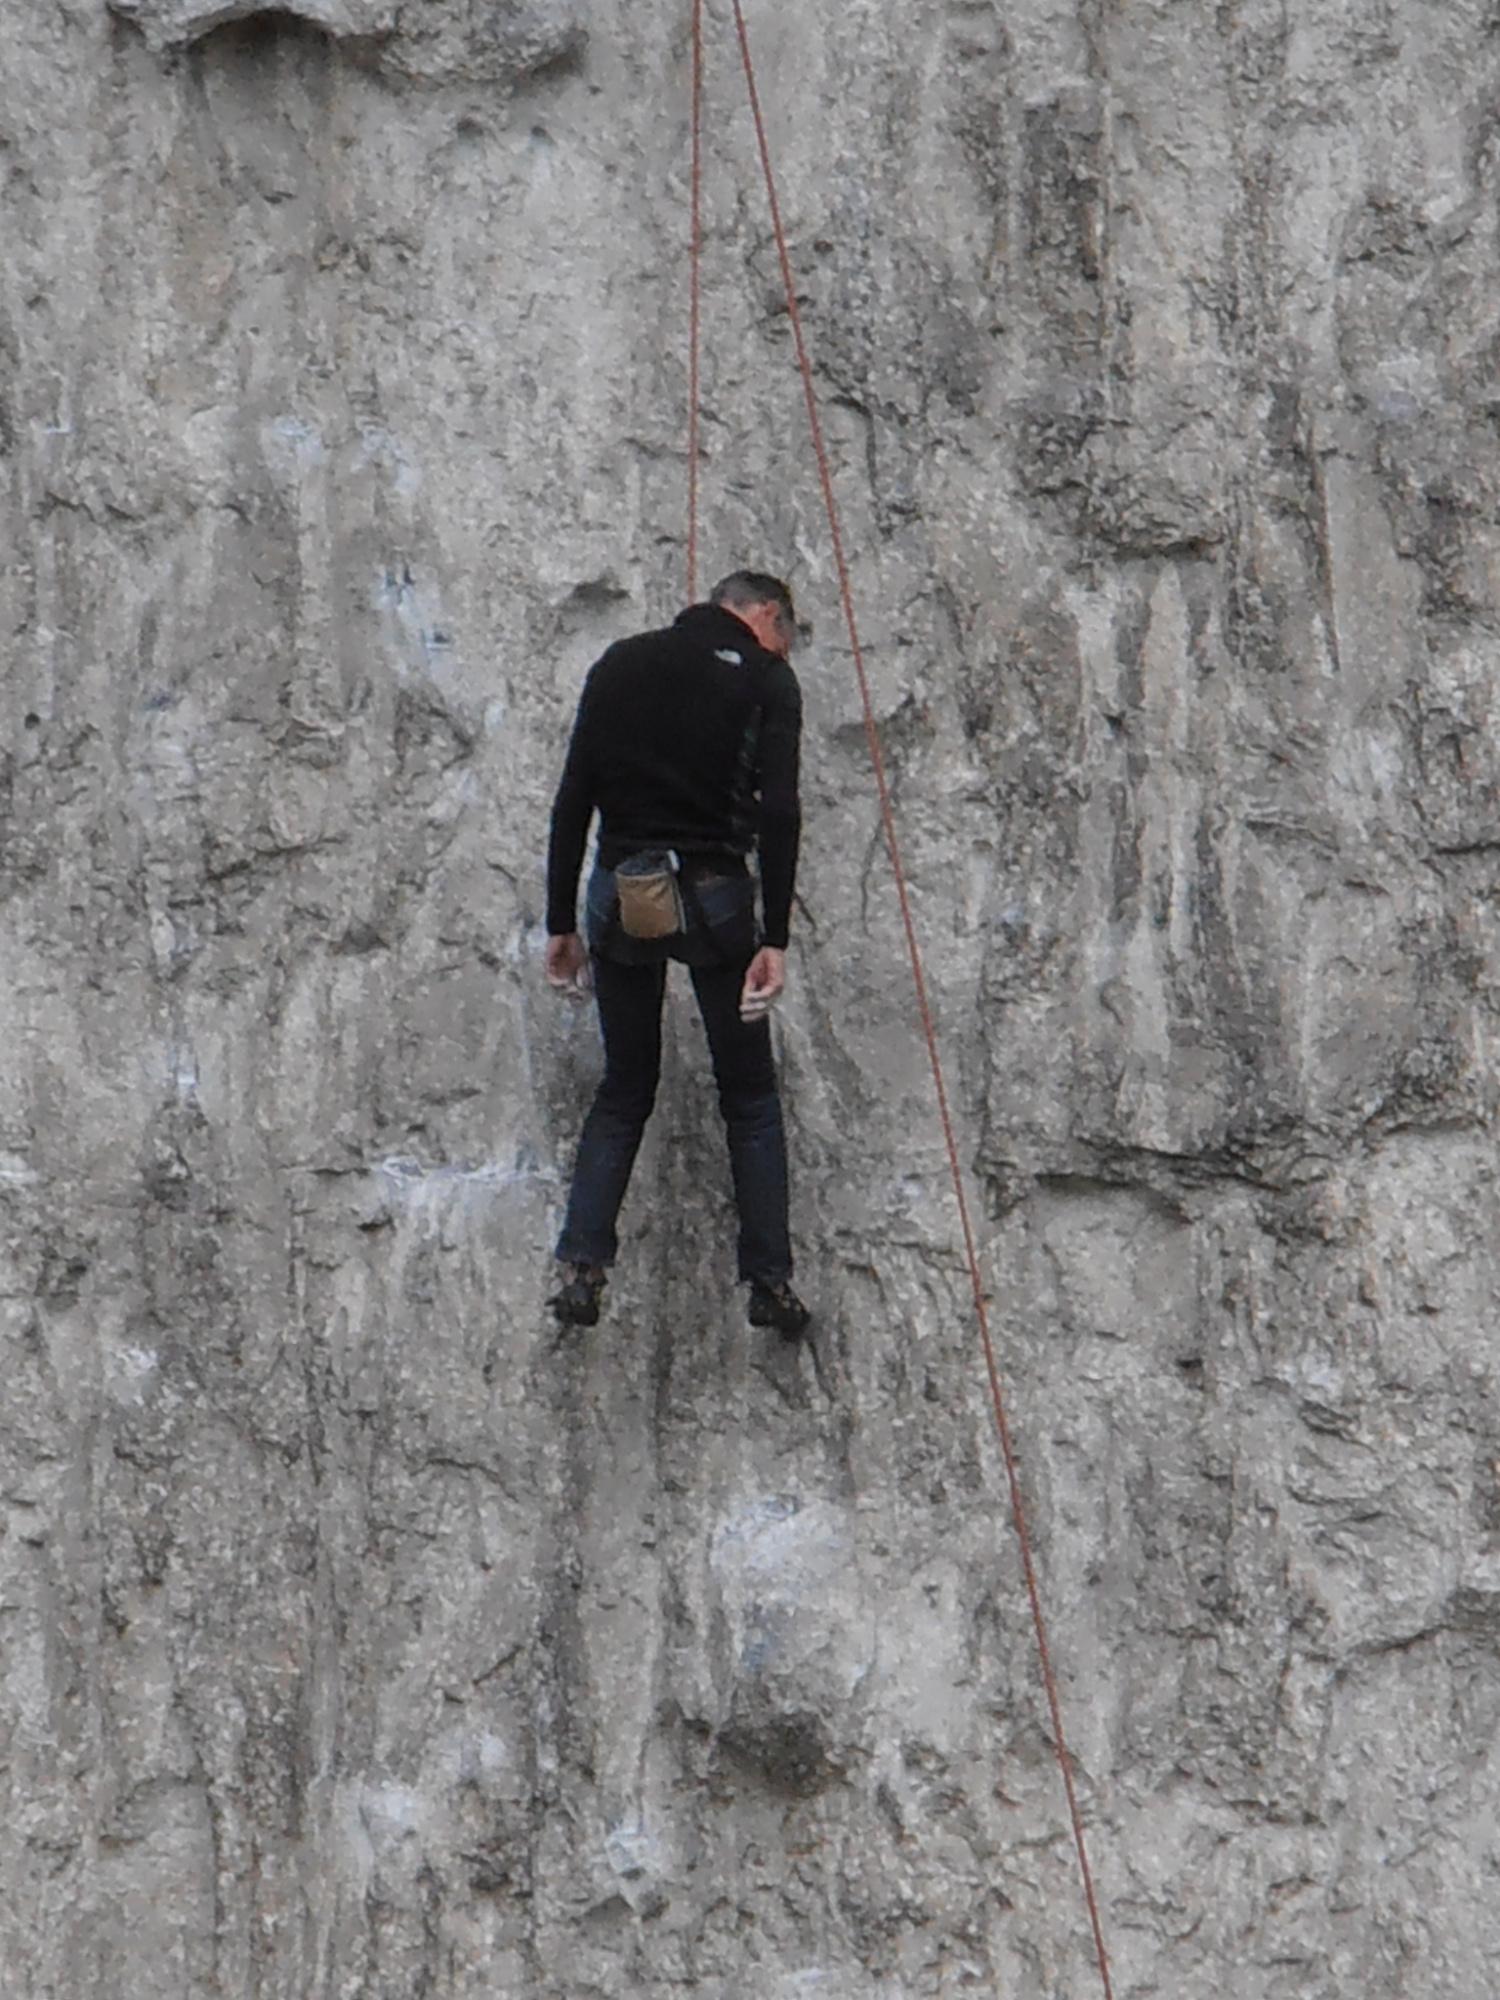 climber takes a break